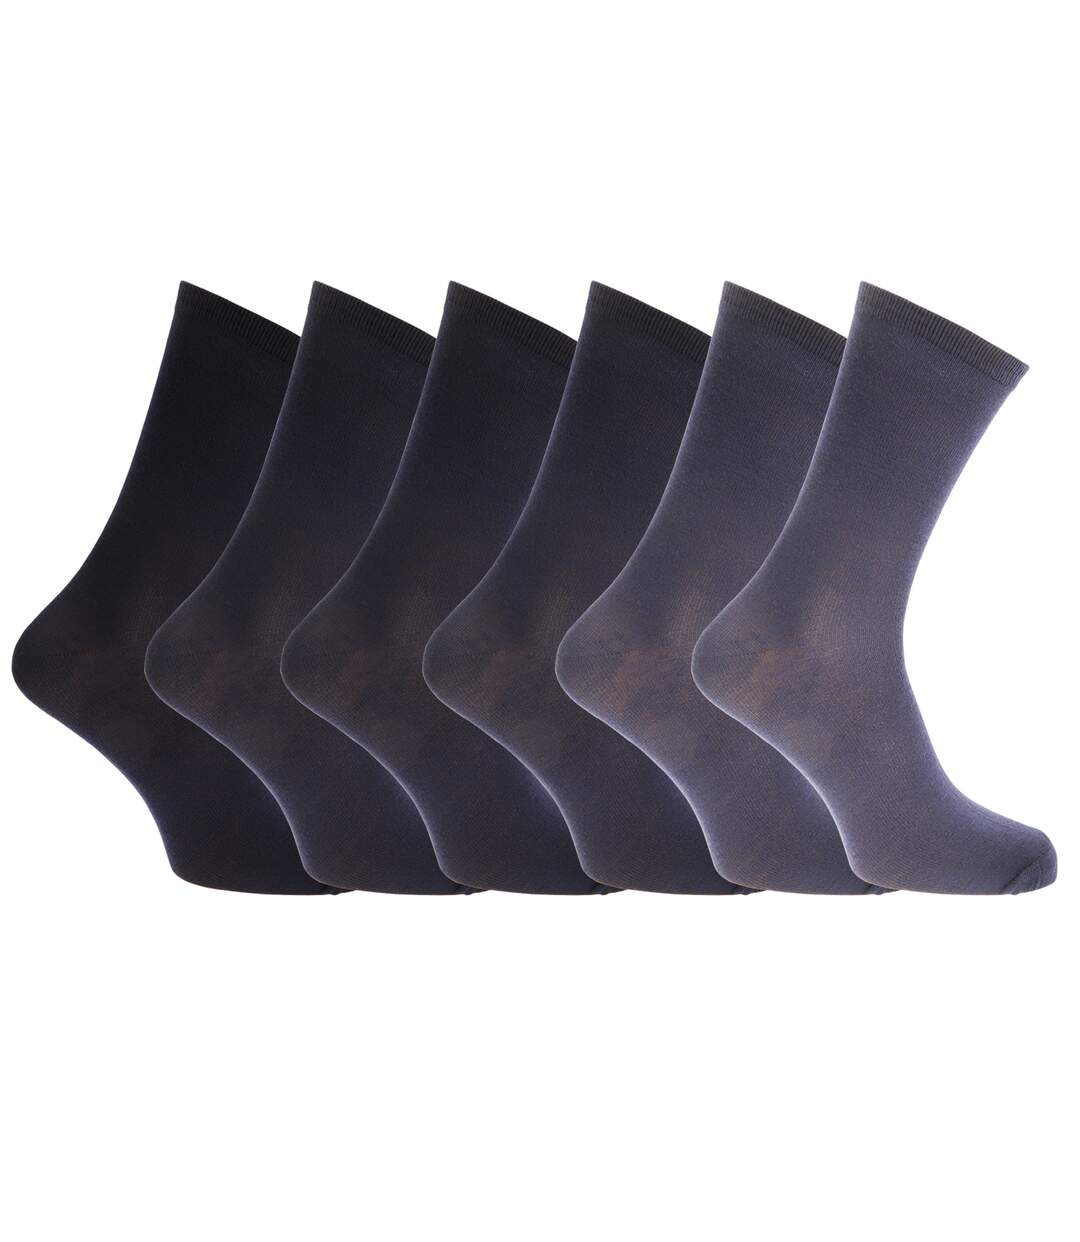 Mens Plain Socks With Ribbed Top (Pack Of 6) (Navy/Grey) - UTMB300